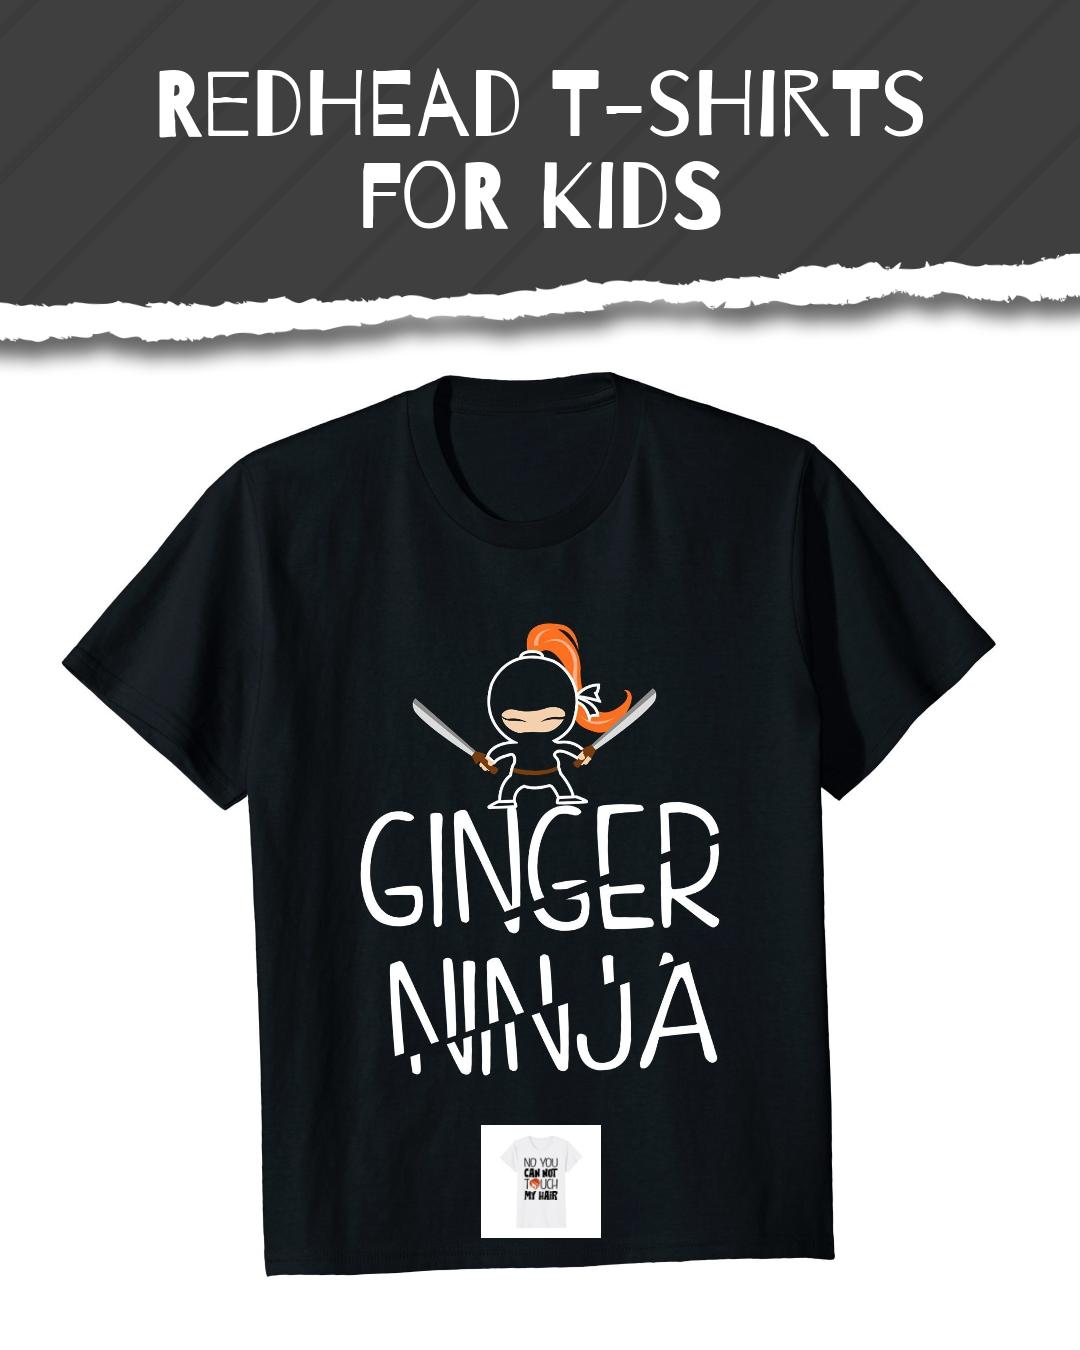 Redhead T Shirts For Kids Ginger Ninja Funny Ginger T Shirt T Shirt Shirts Mens Tops